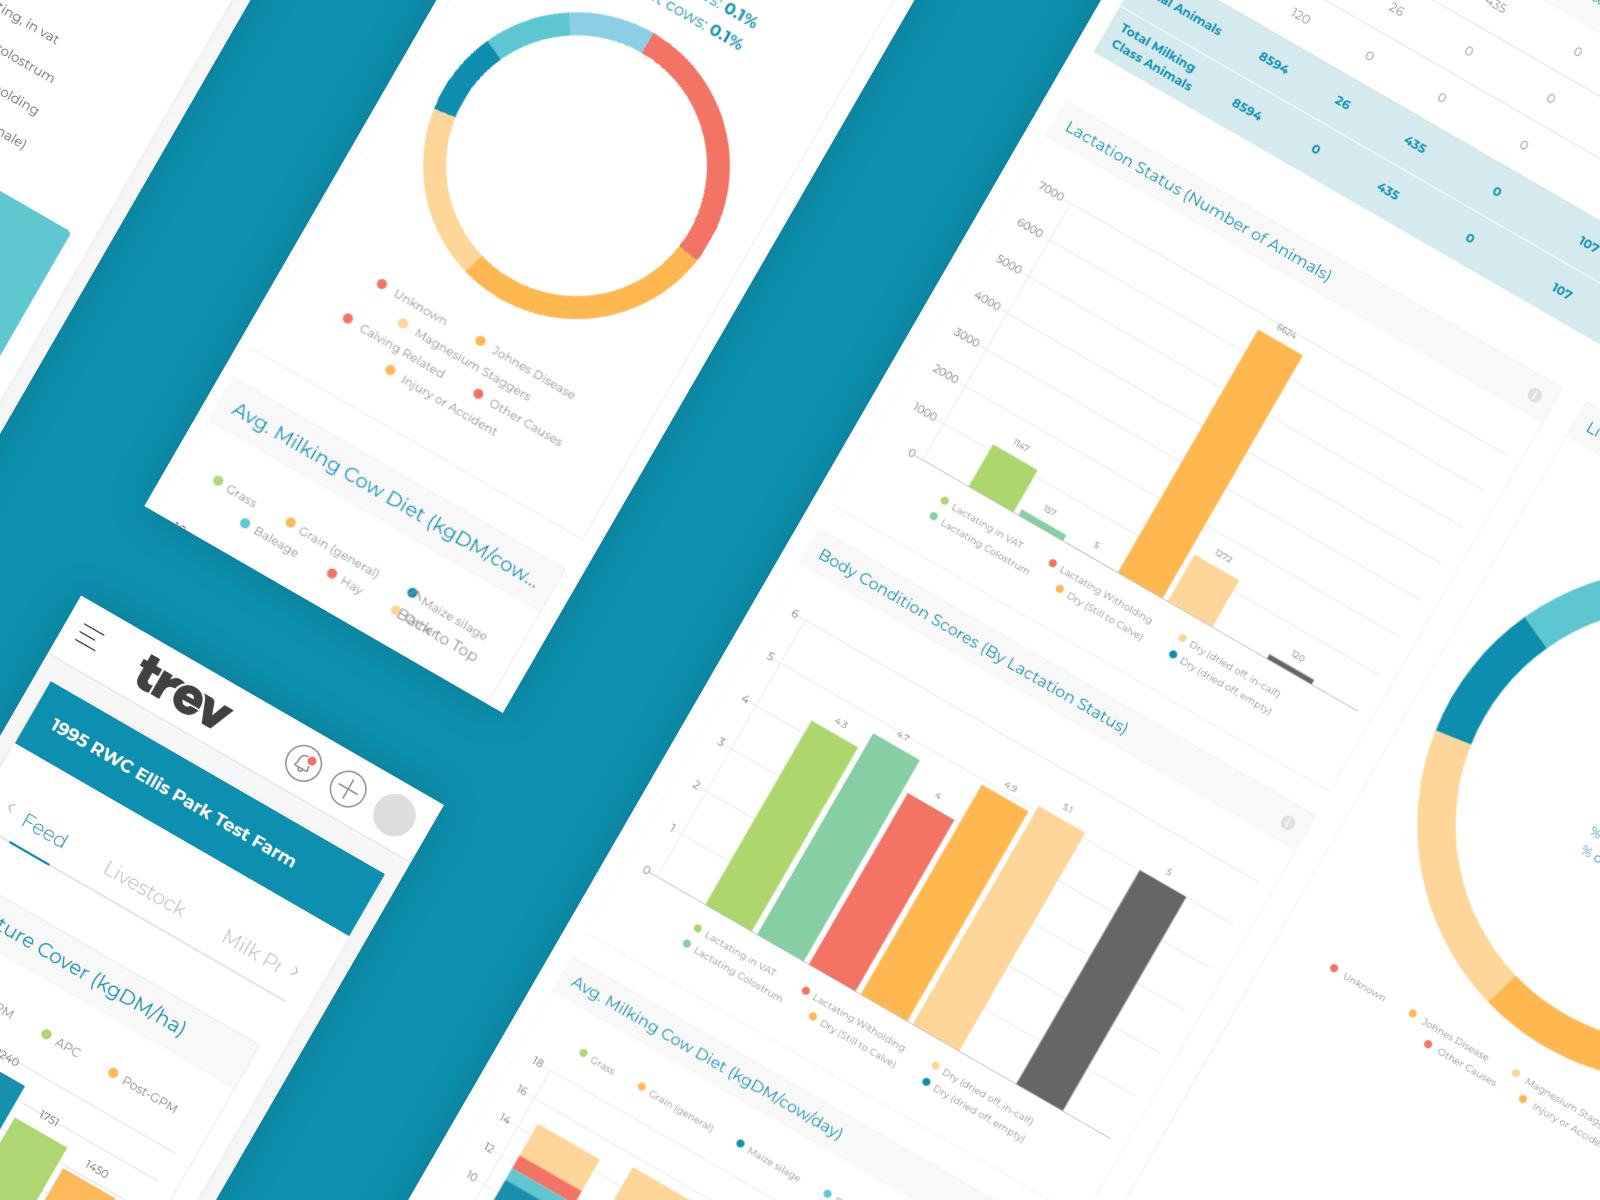 Trev - Insights & Analytics Platform